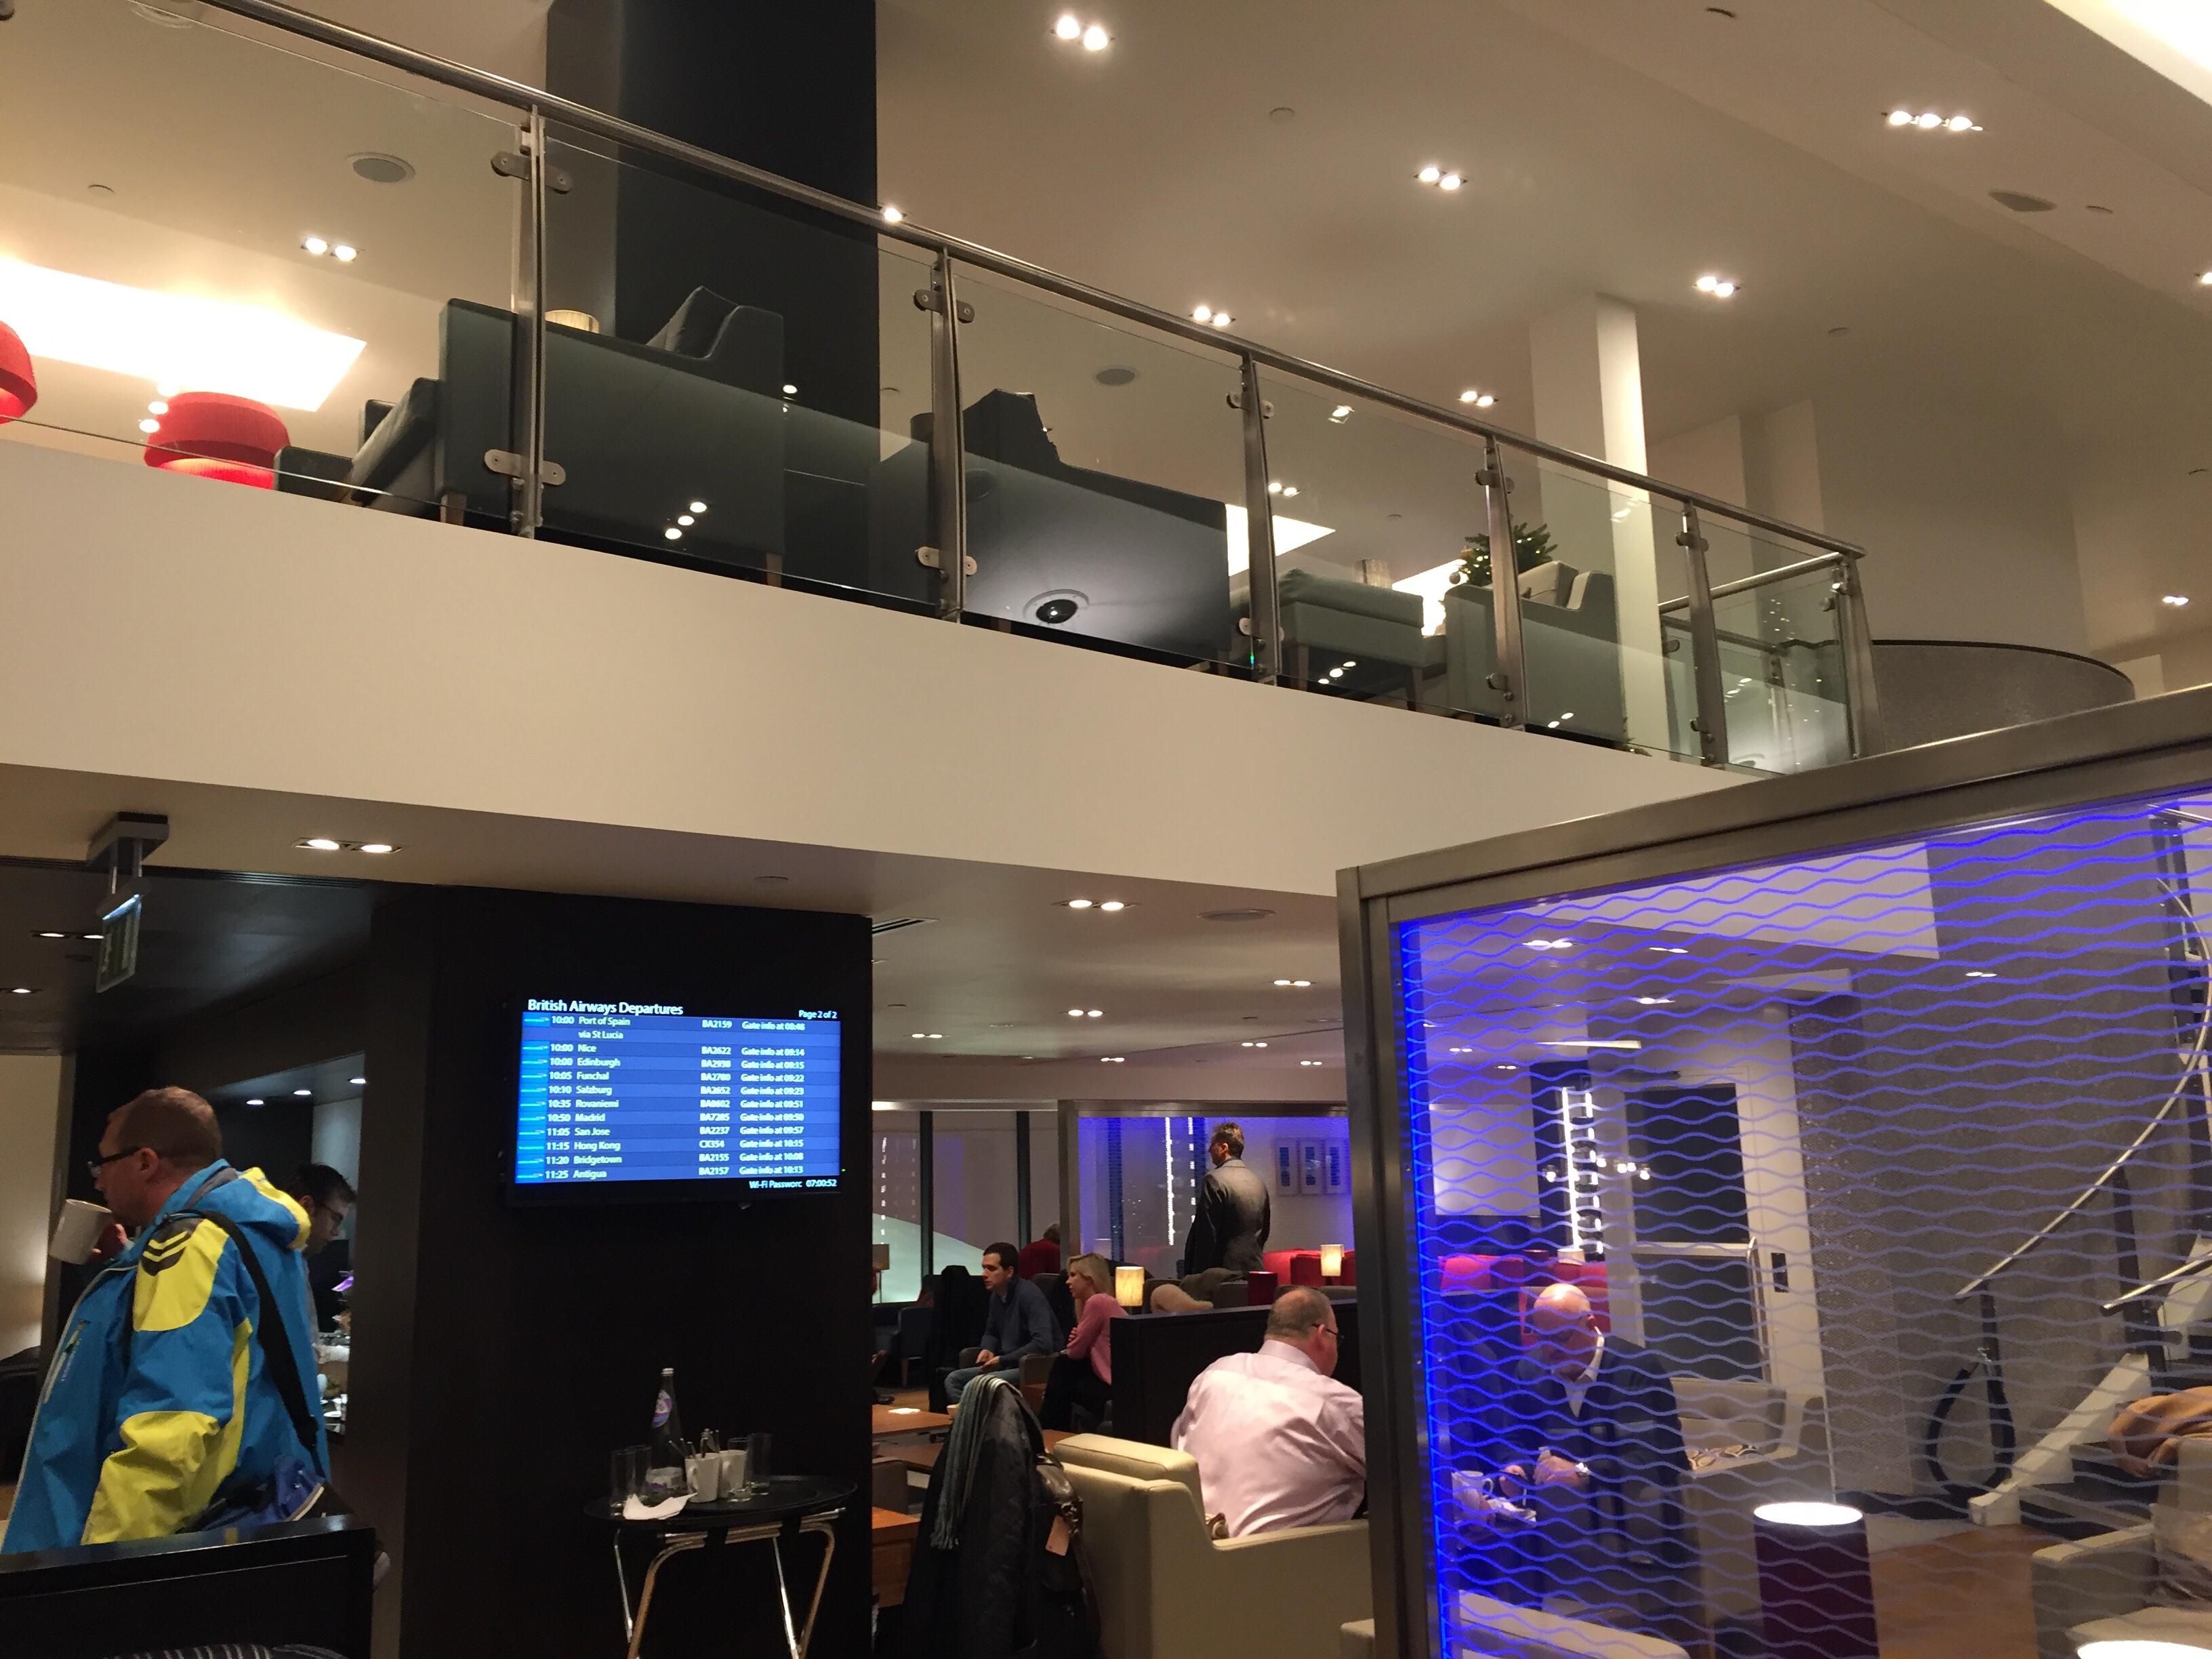 img 0303 - El Salon VIP de British Airways de Londres Gatwick